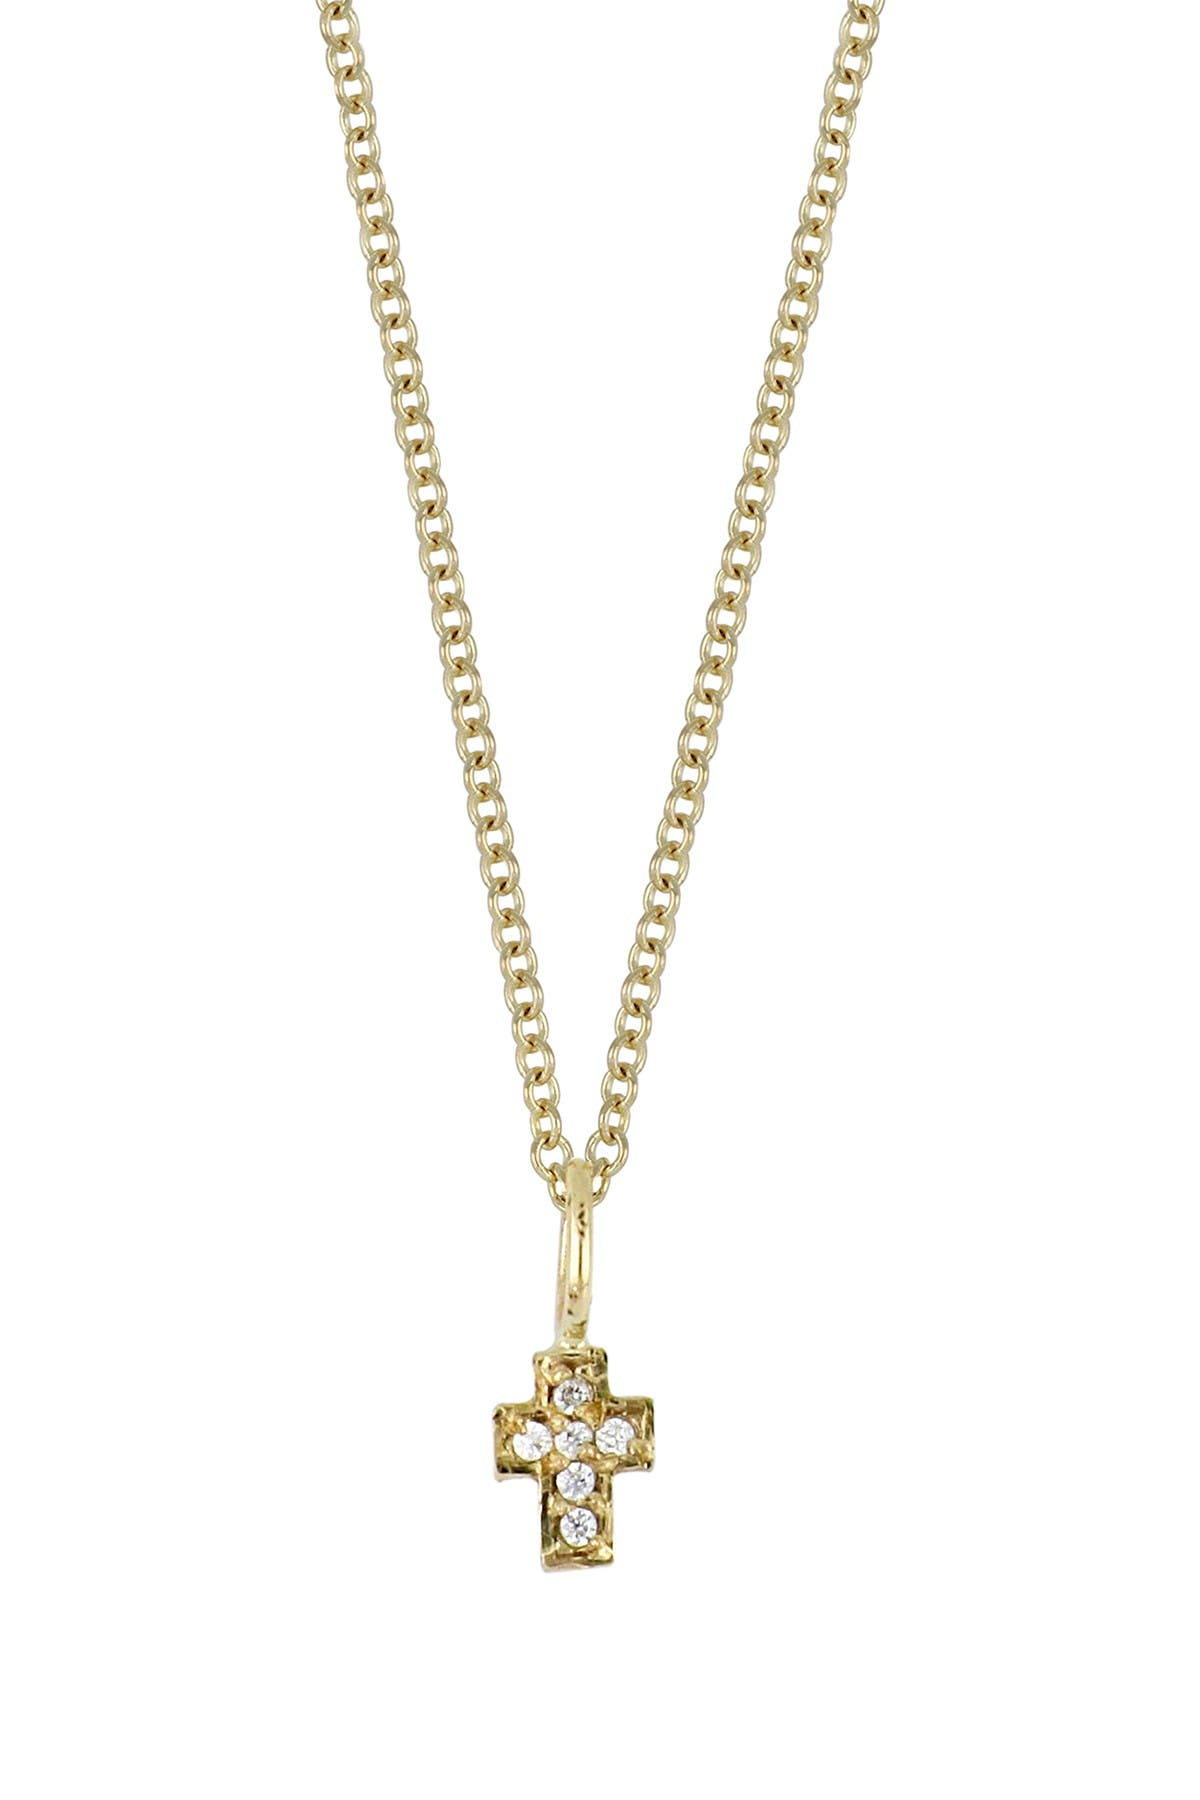 Image of Bony Levy 18K Yellow Gold Diamond Cross Pendant Necklace - 0.02 ctw